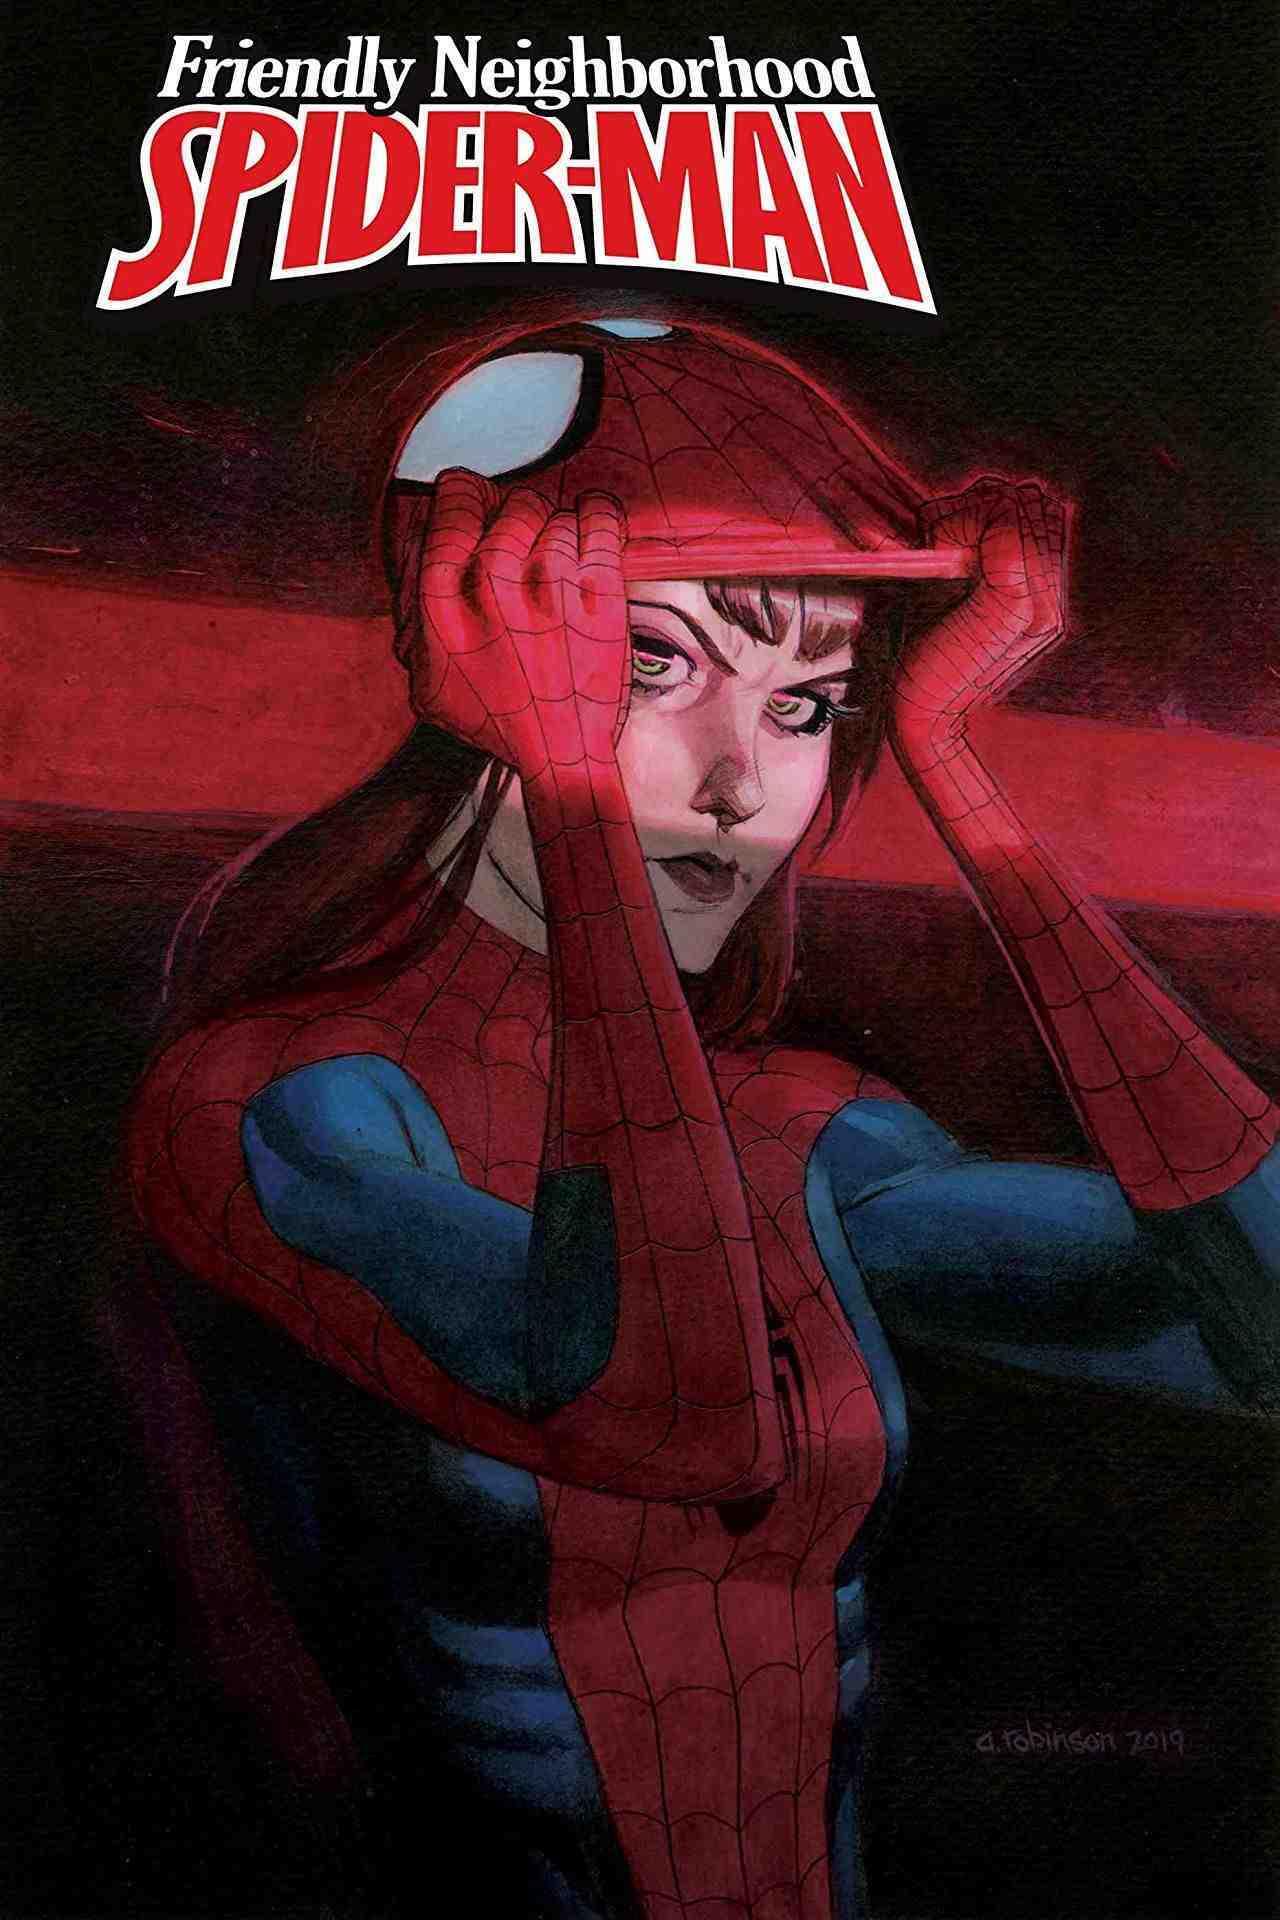 Friendly Neighborhood Spider-Man 11